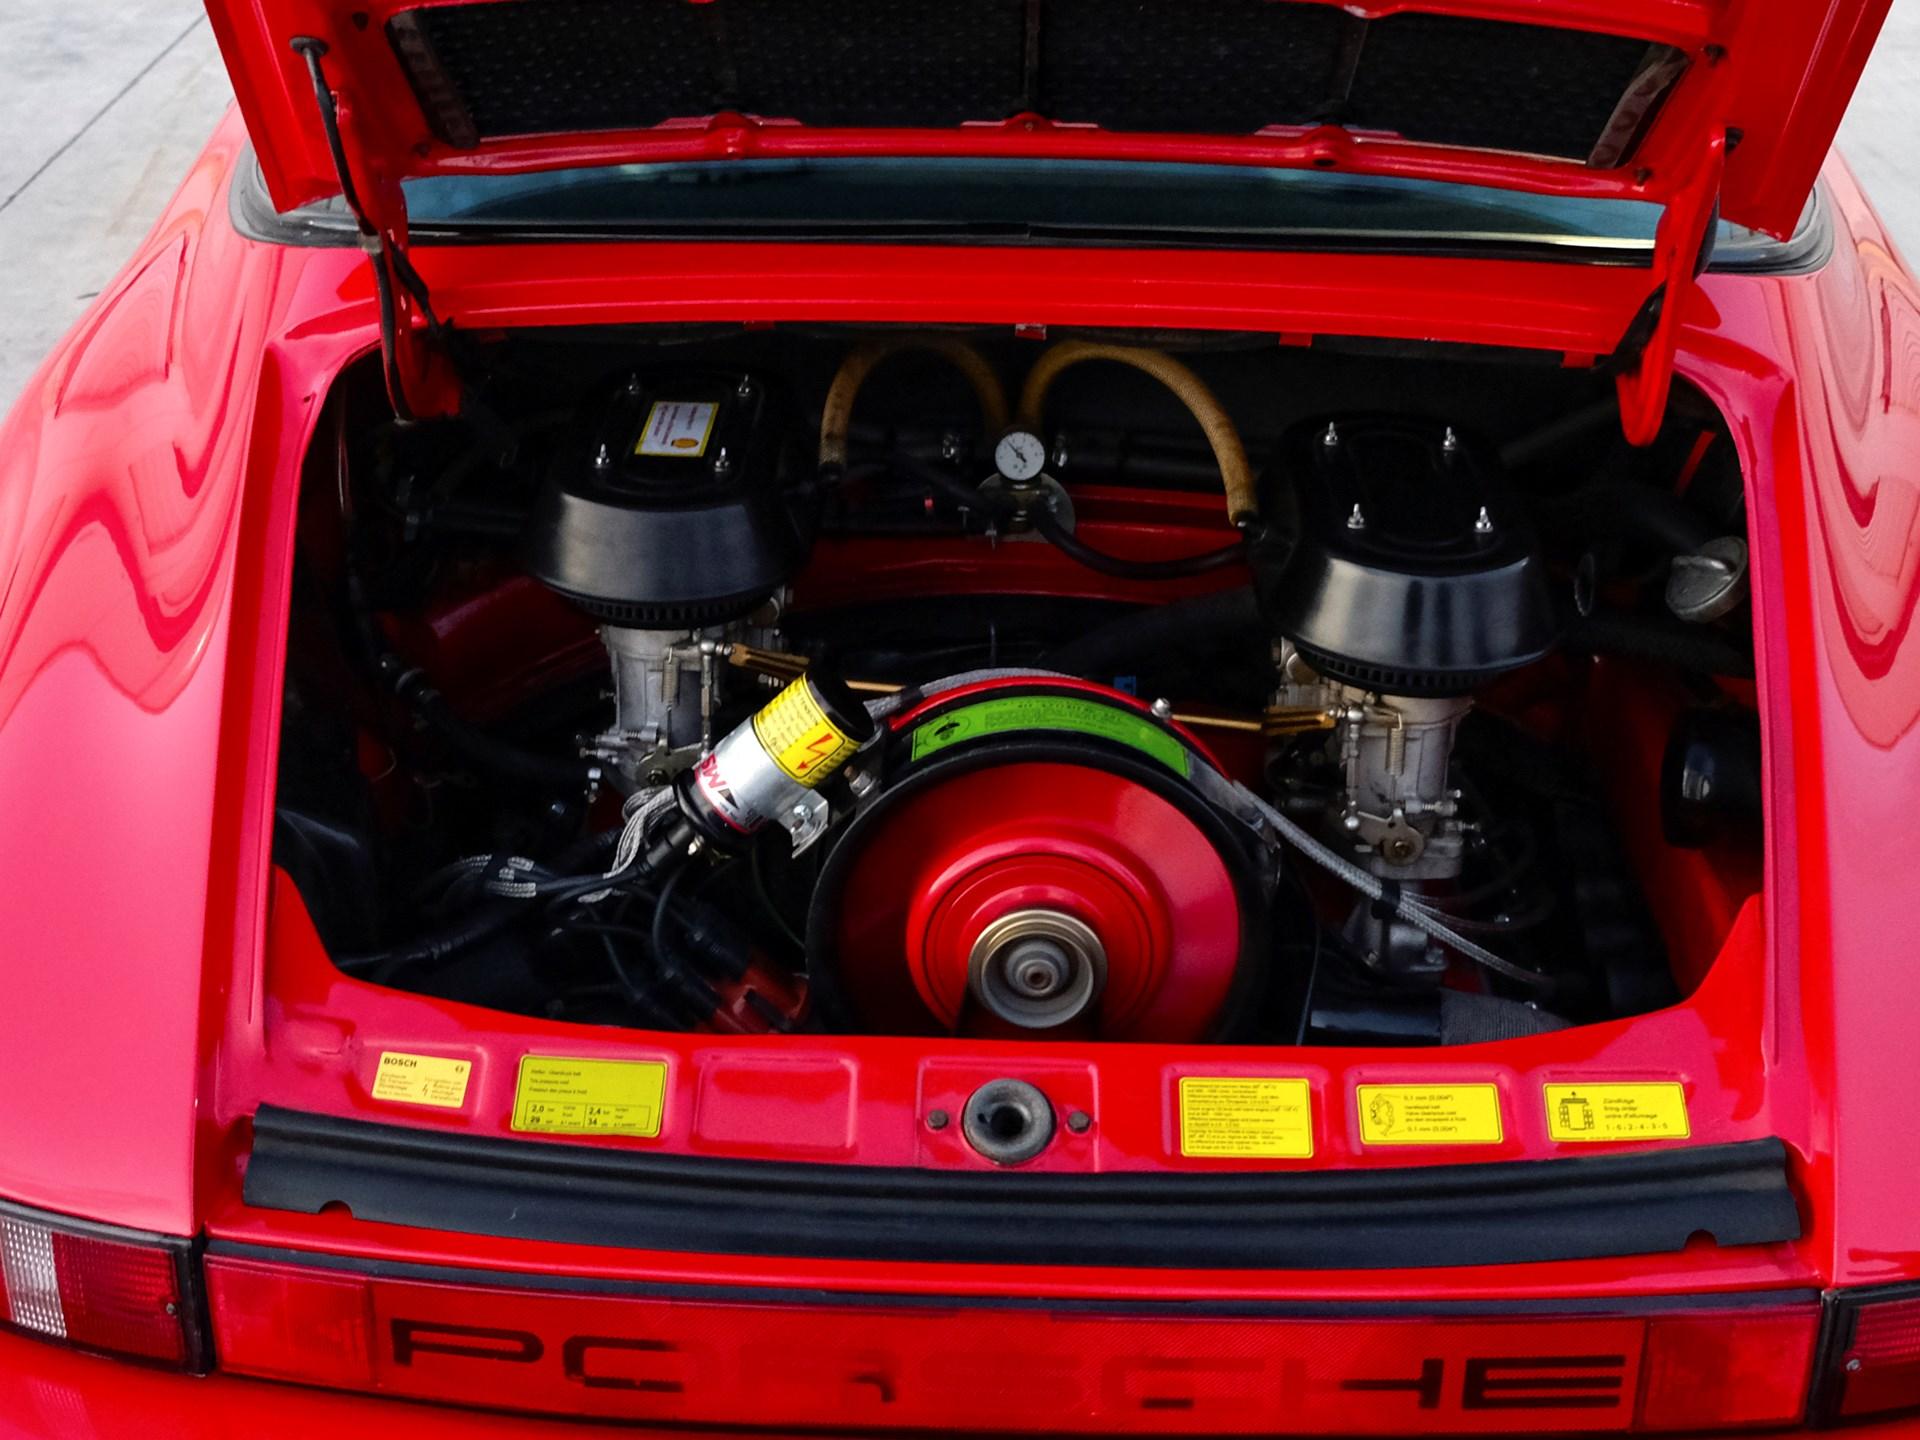 1980 Porsche 911 SC Targa engine